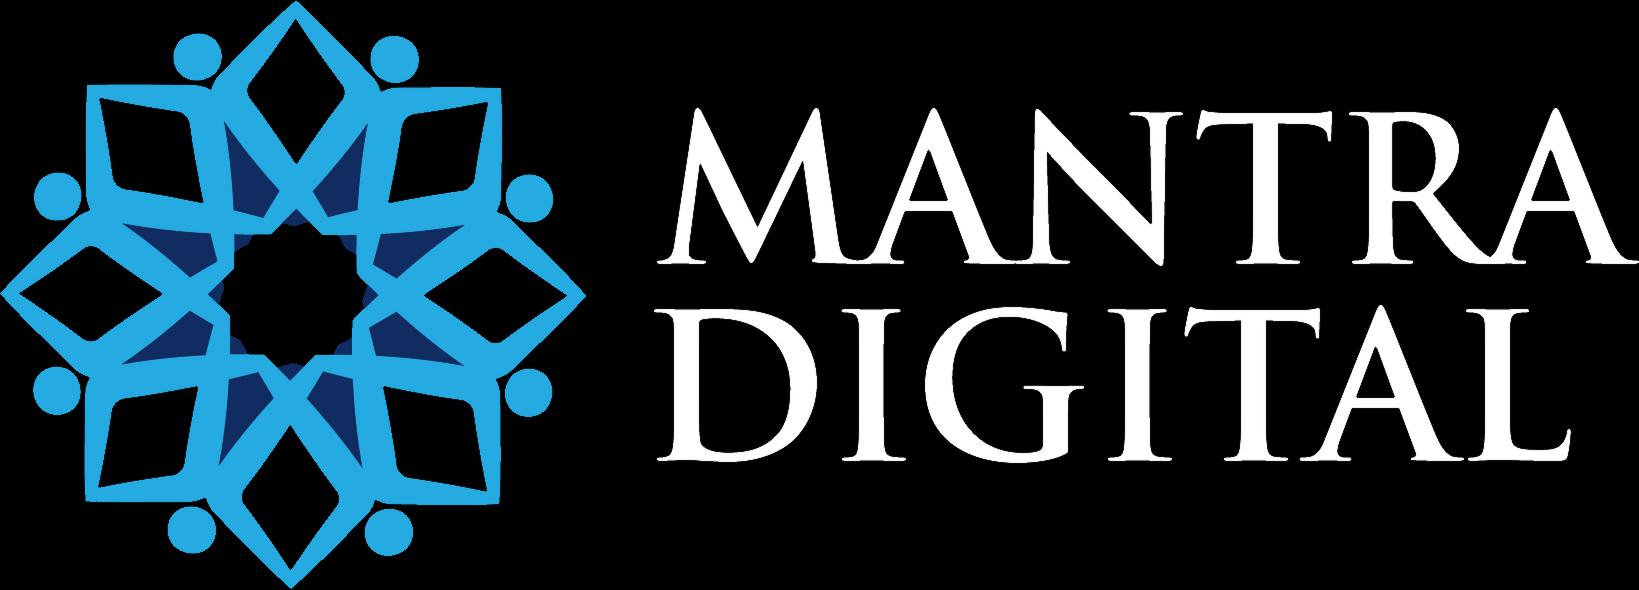 Mantra Digital